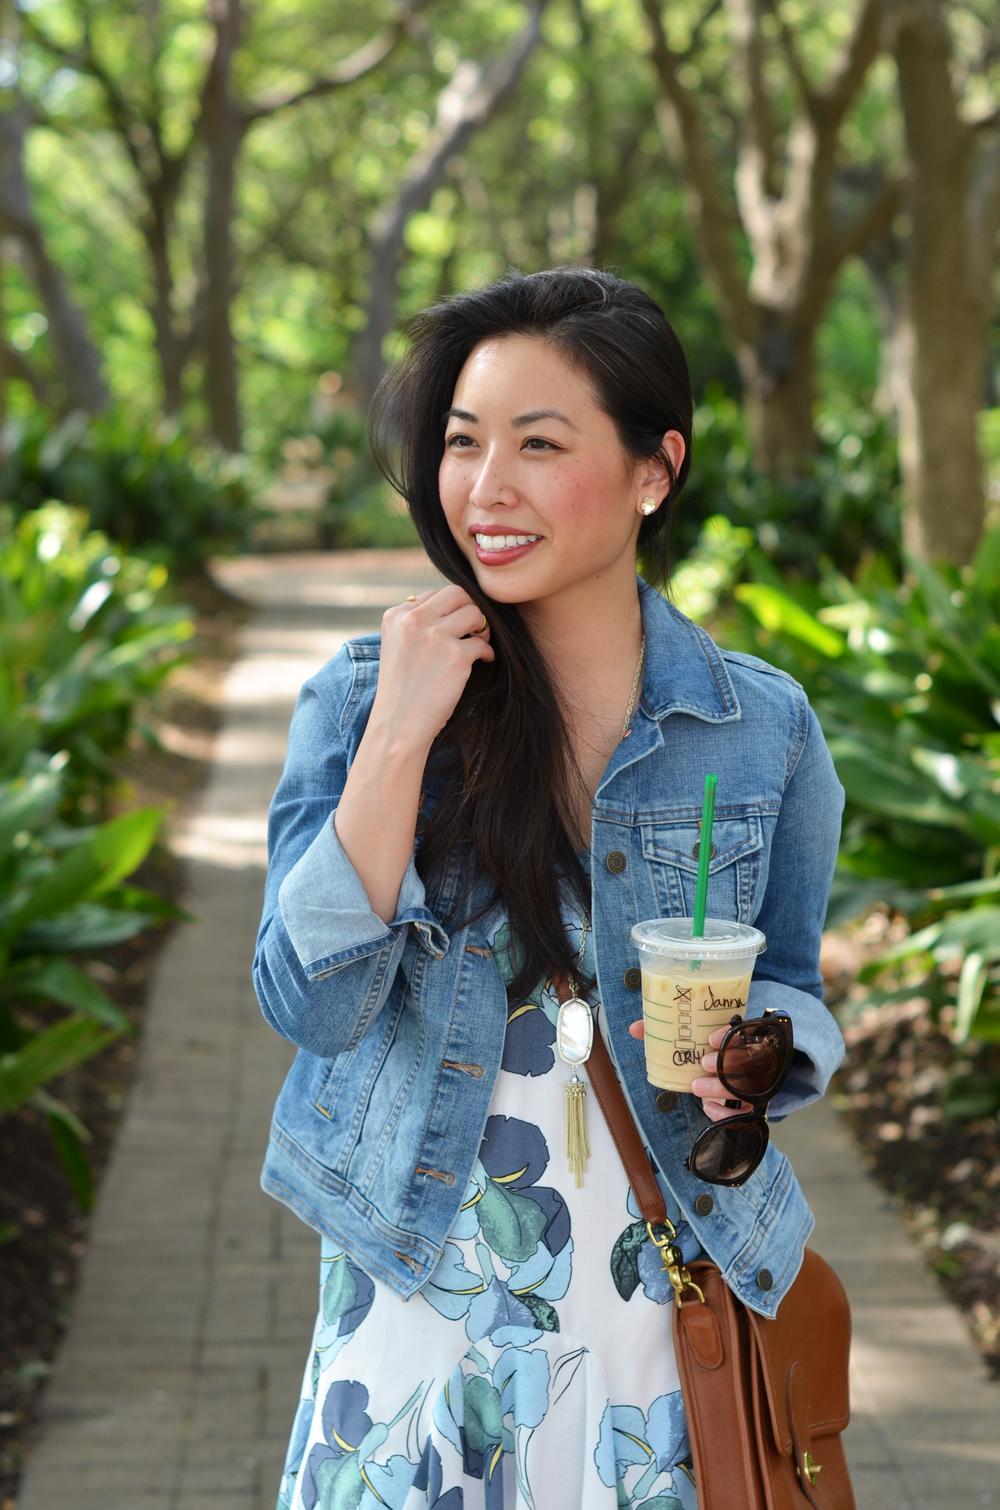 the floral ruffled dress & denim jacket -- jannadoan.com